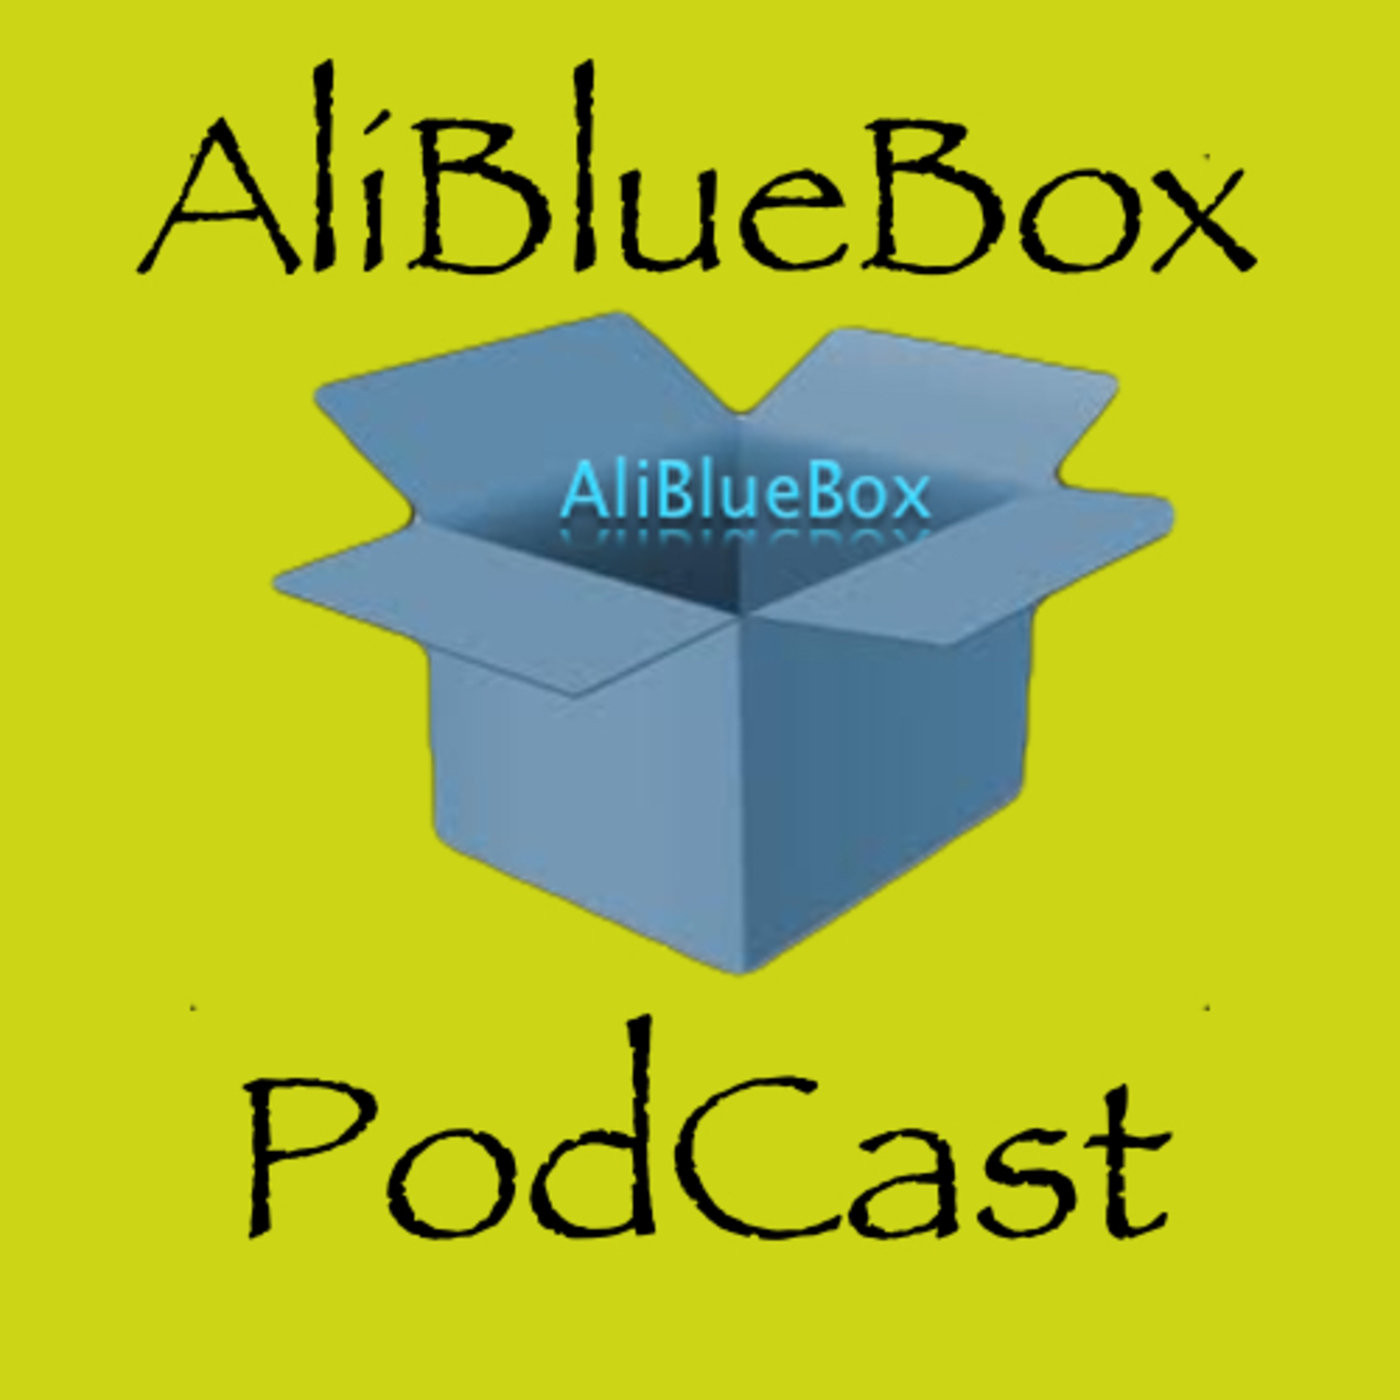 AliBlueBox PodCast